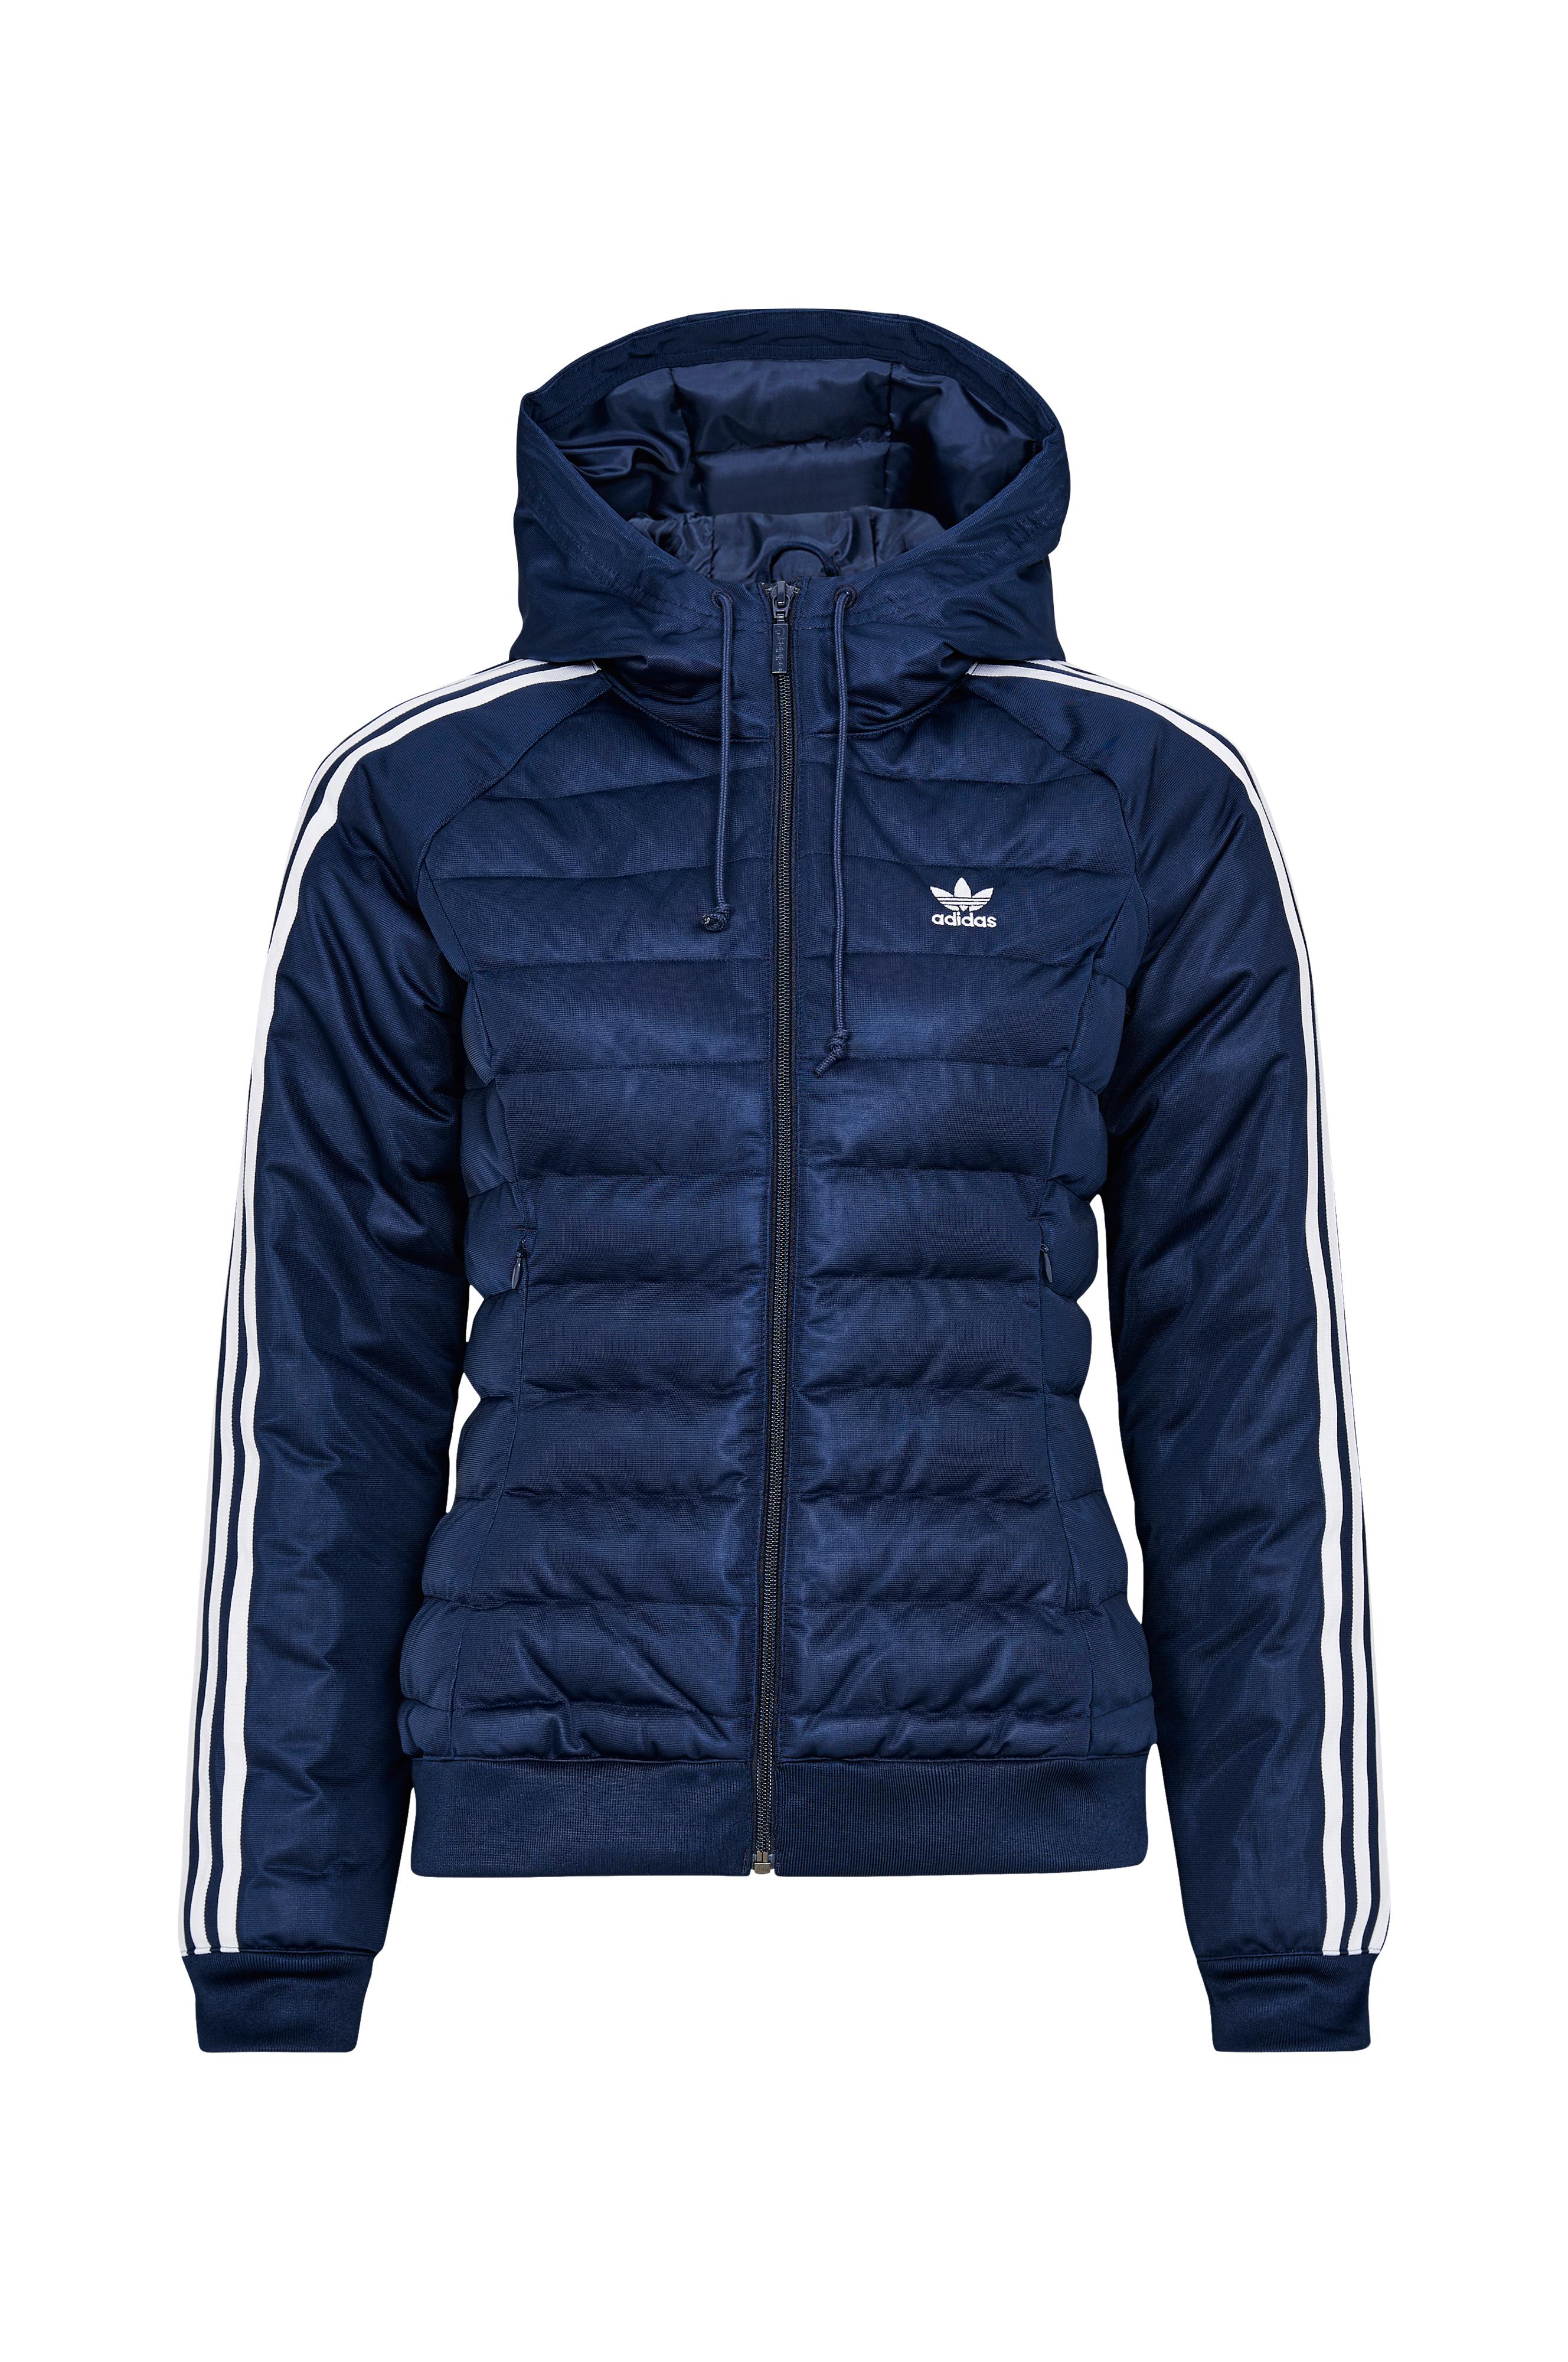 adidas Originals Jakke Slim Jacket Blå Dame Ellos.no